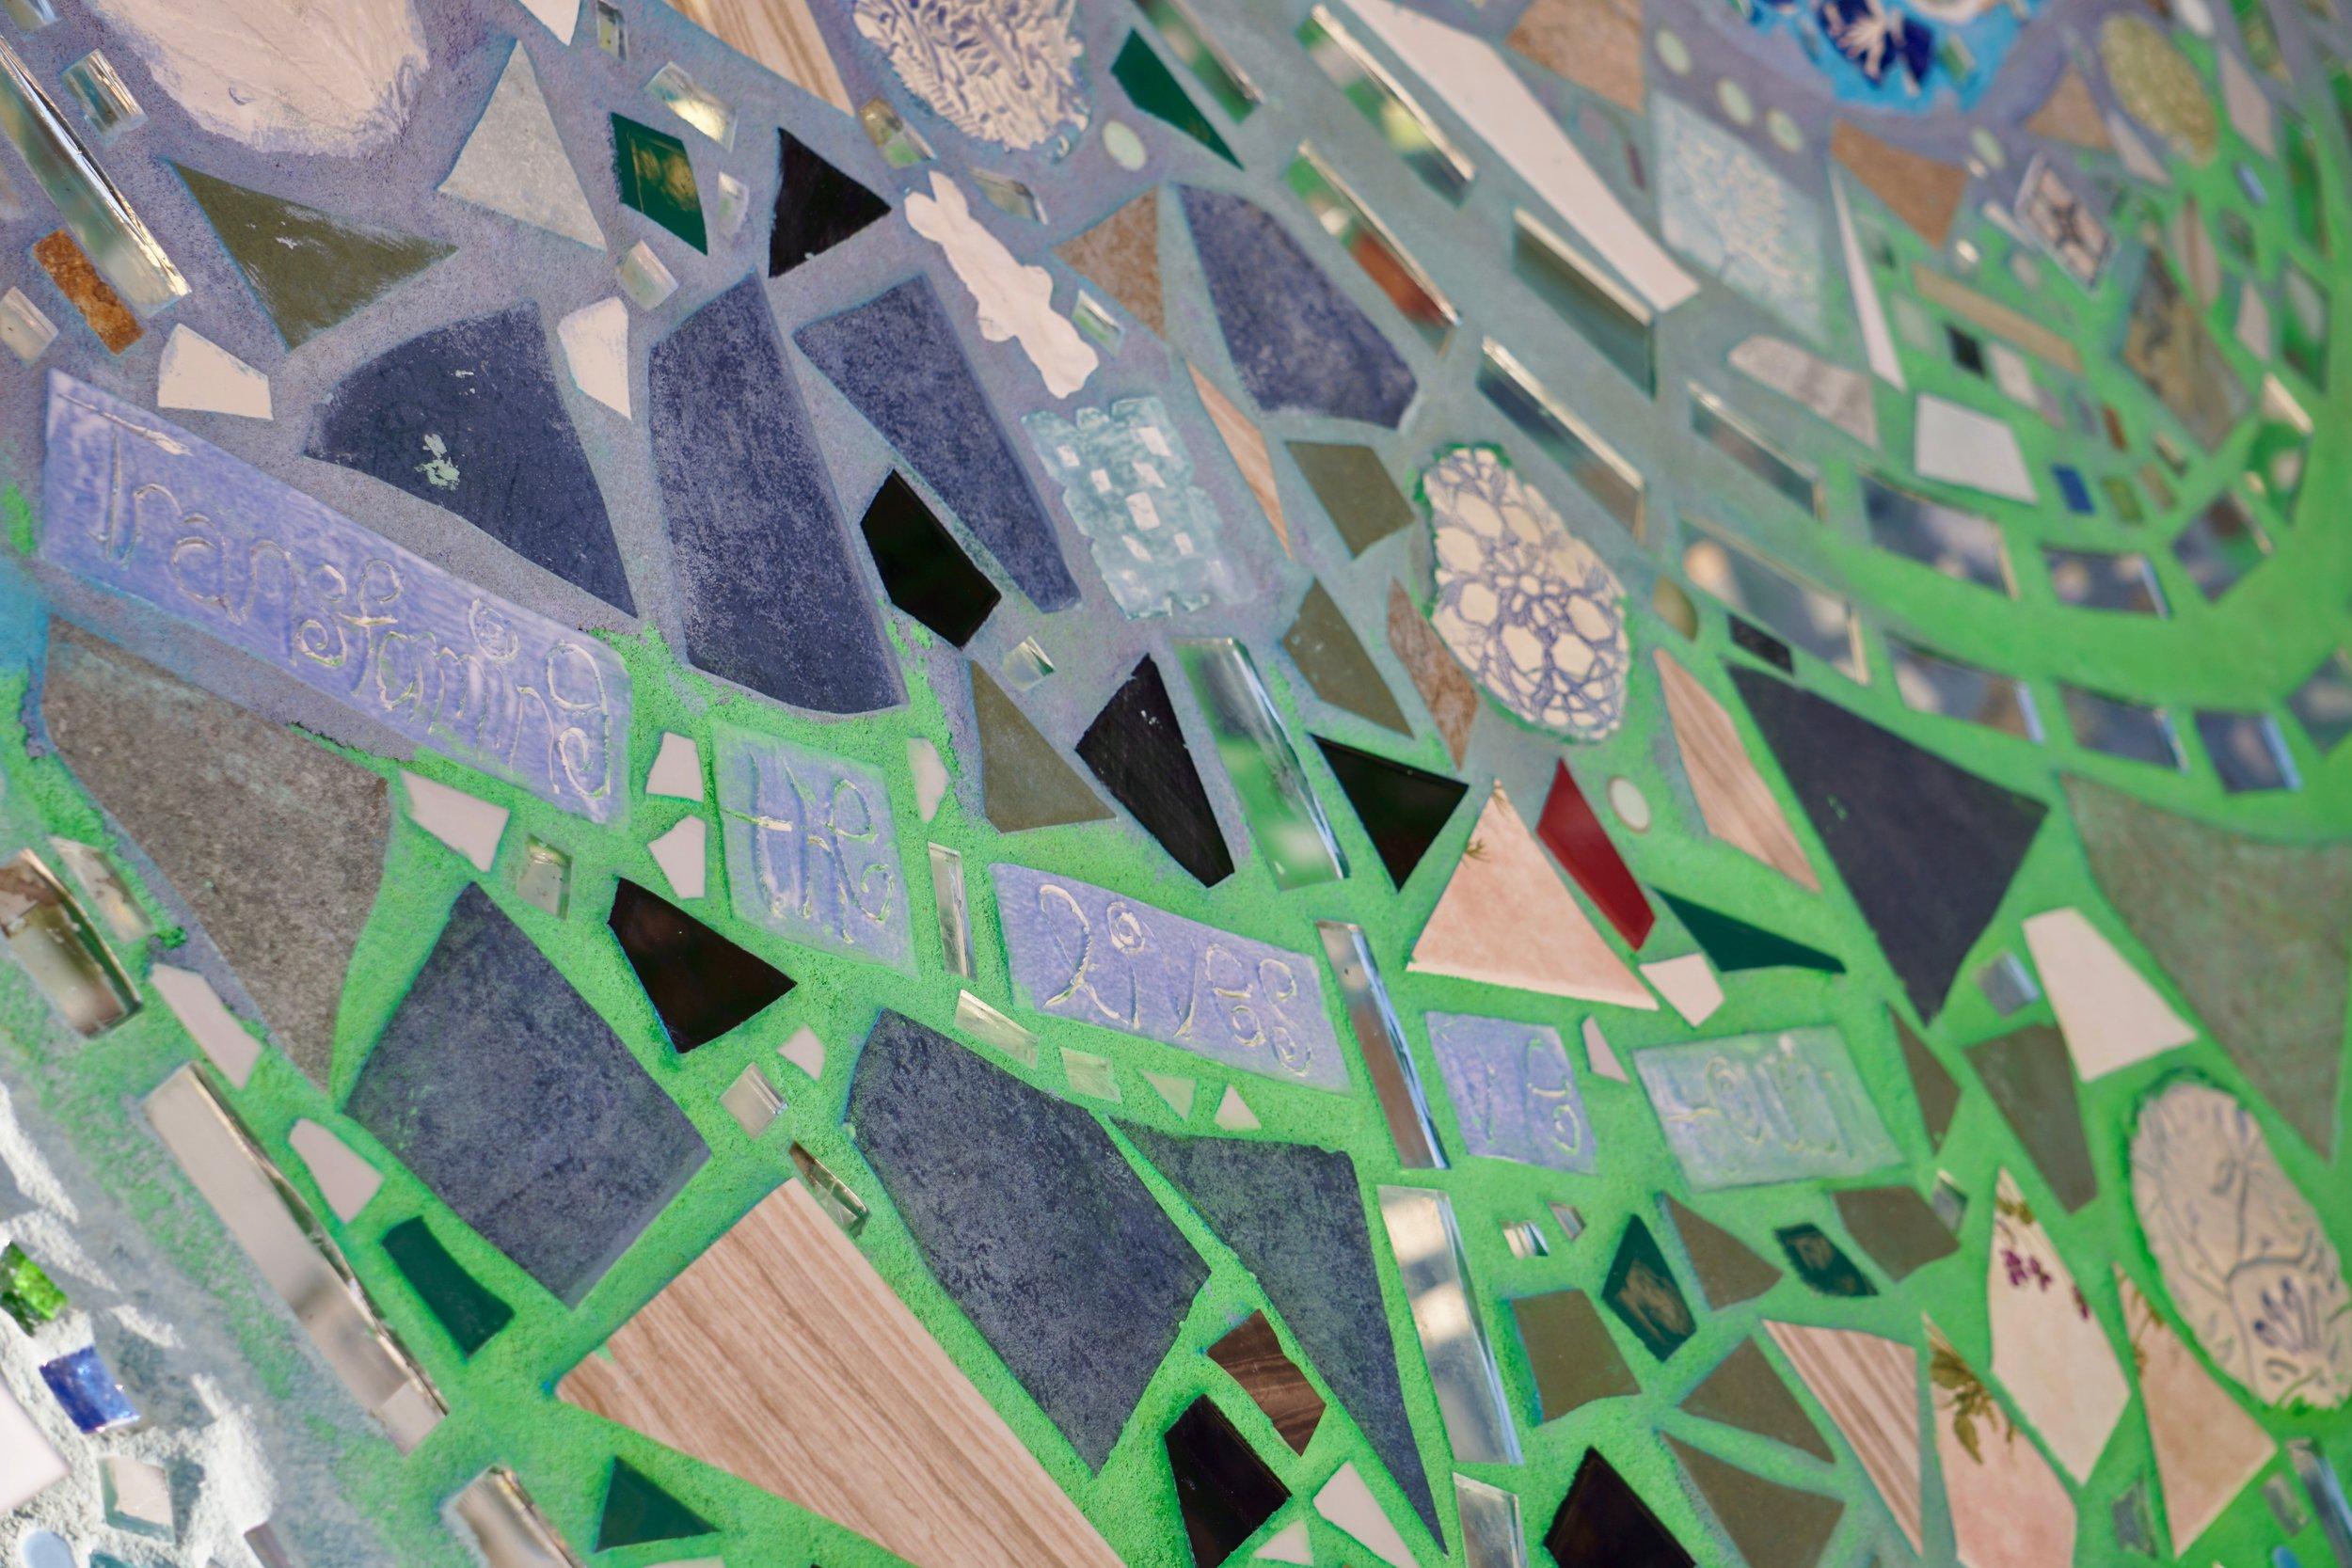 Isaiah Zagar Mosaic Mural for glassboro19.jpg